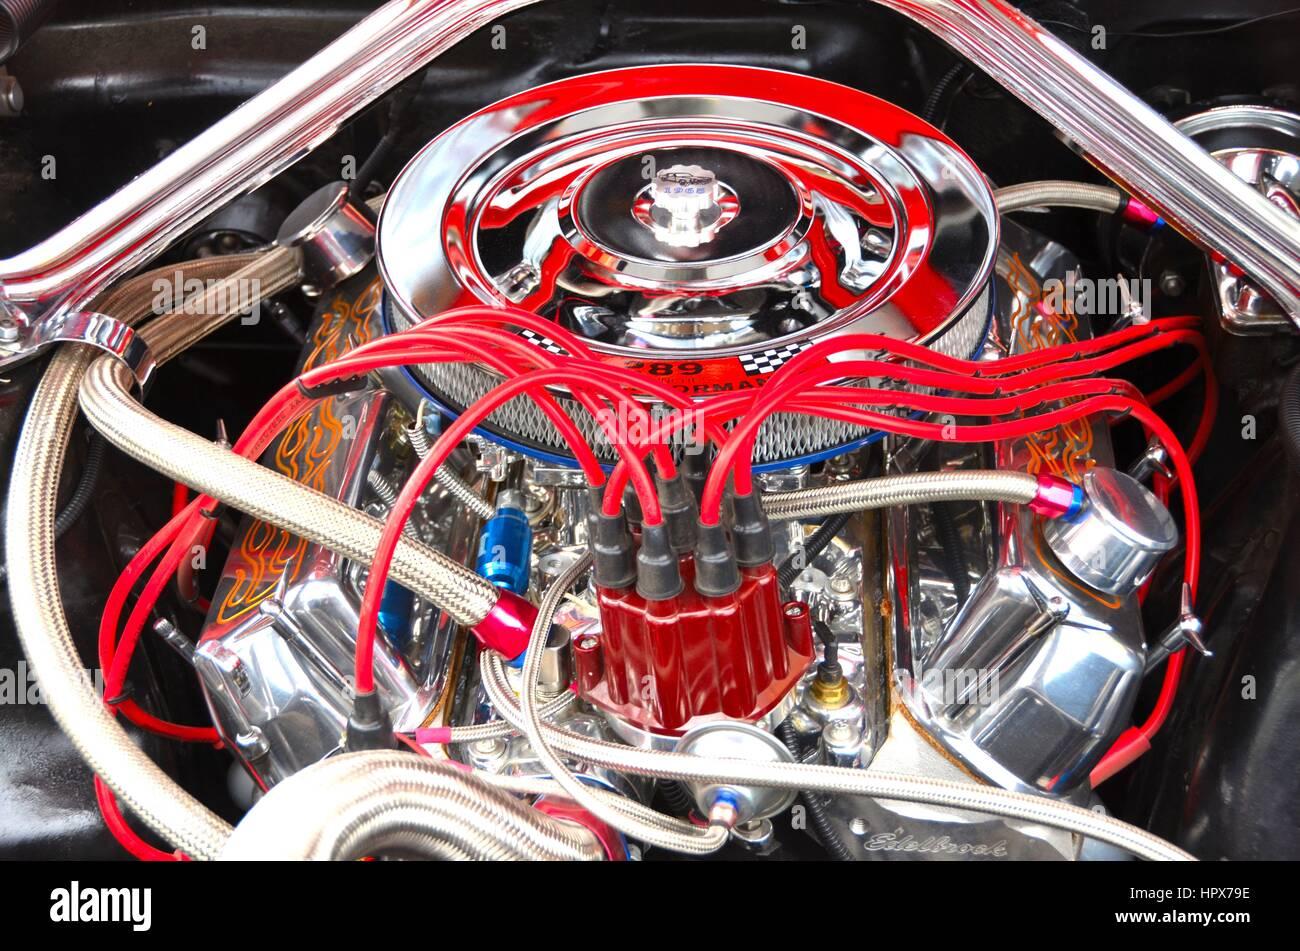 Hohe Leistung auto motor Teile Stockfoto, Bild: 134571514 - Alamy